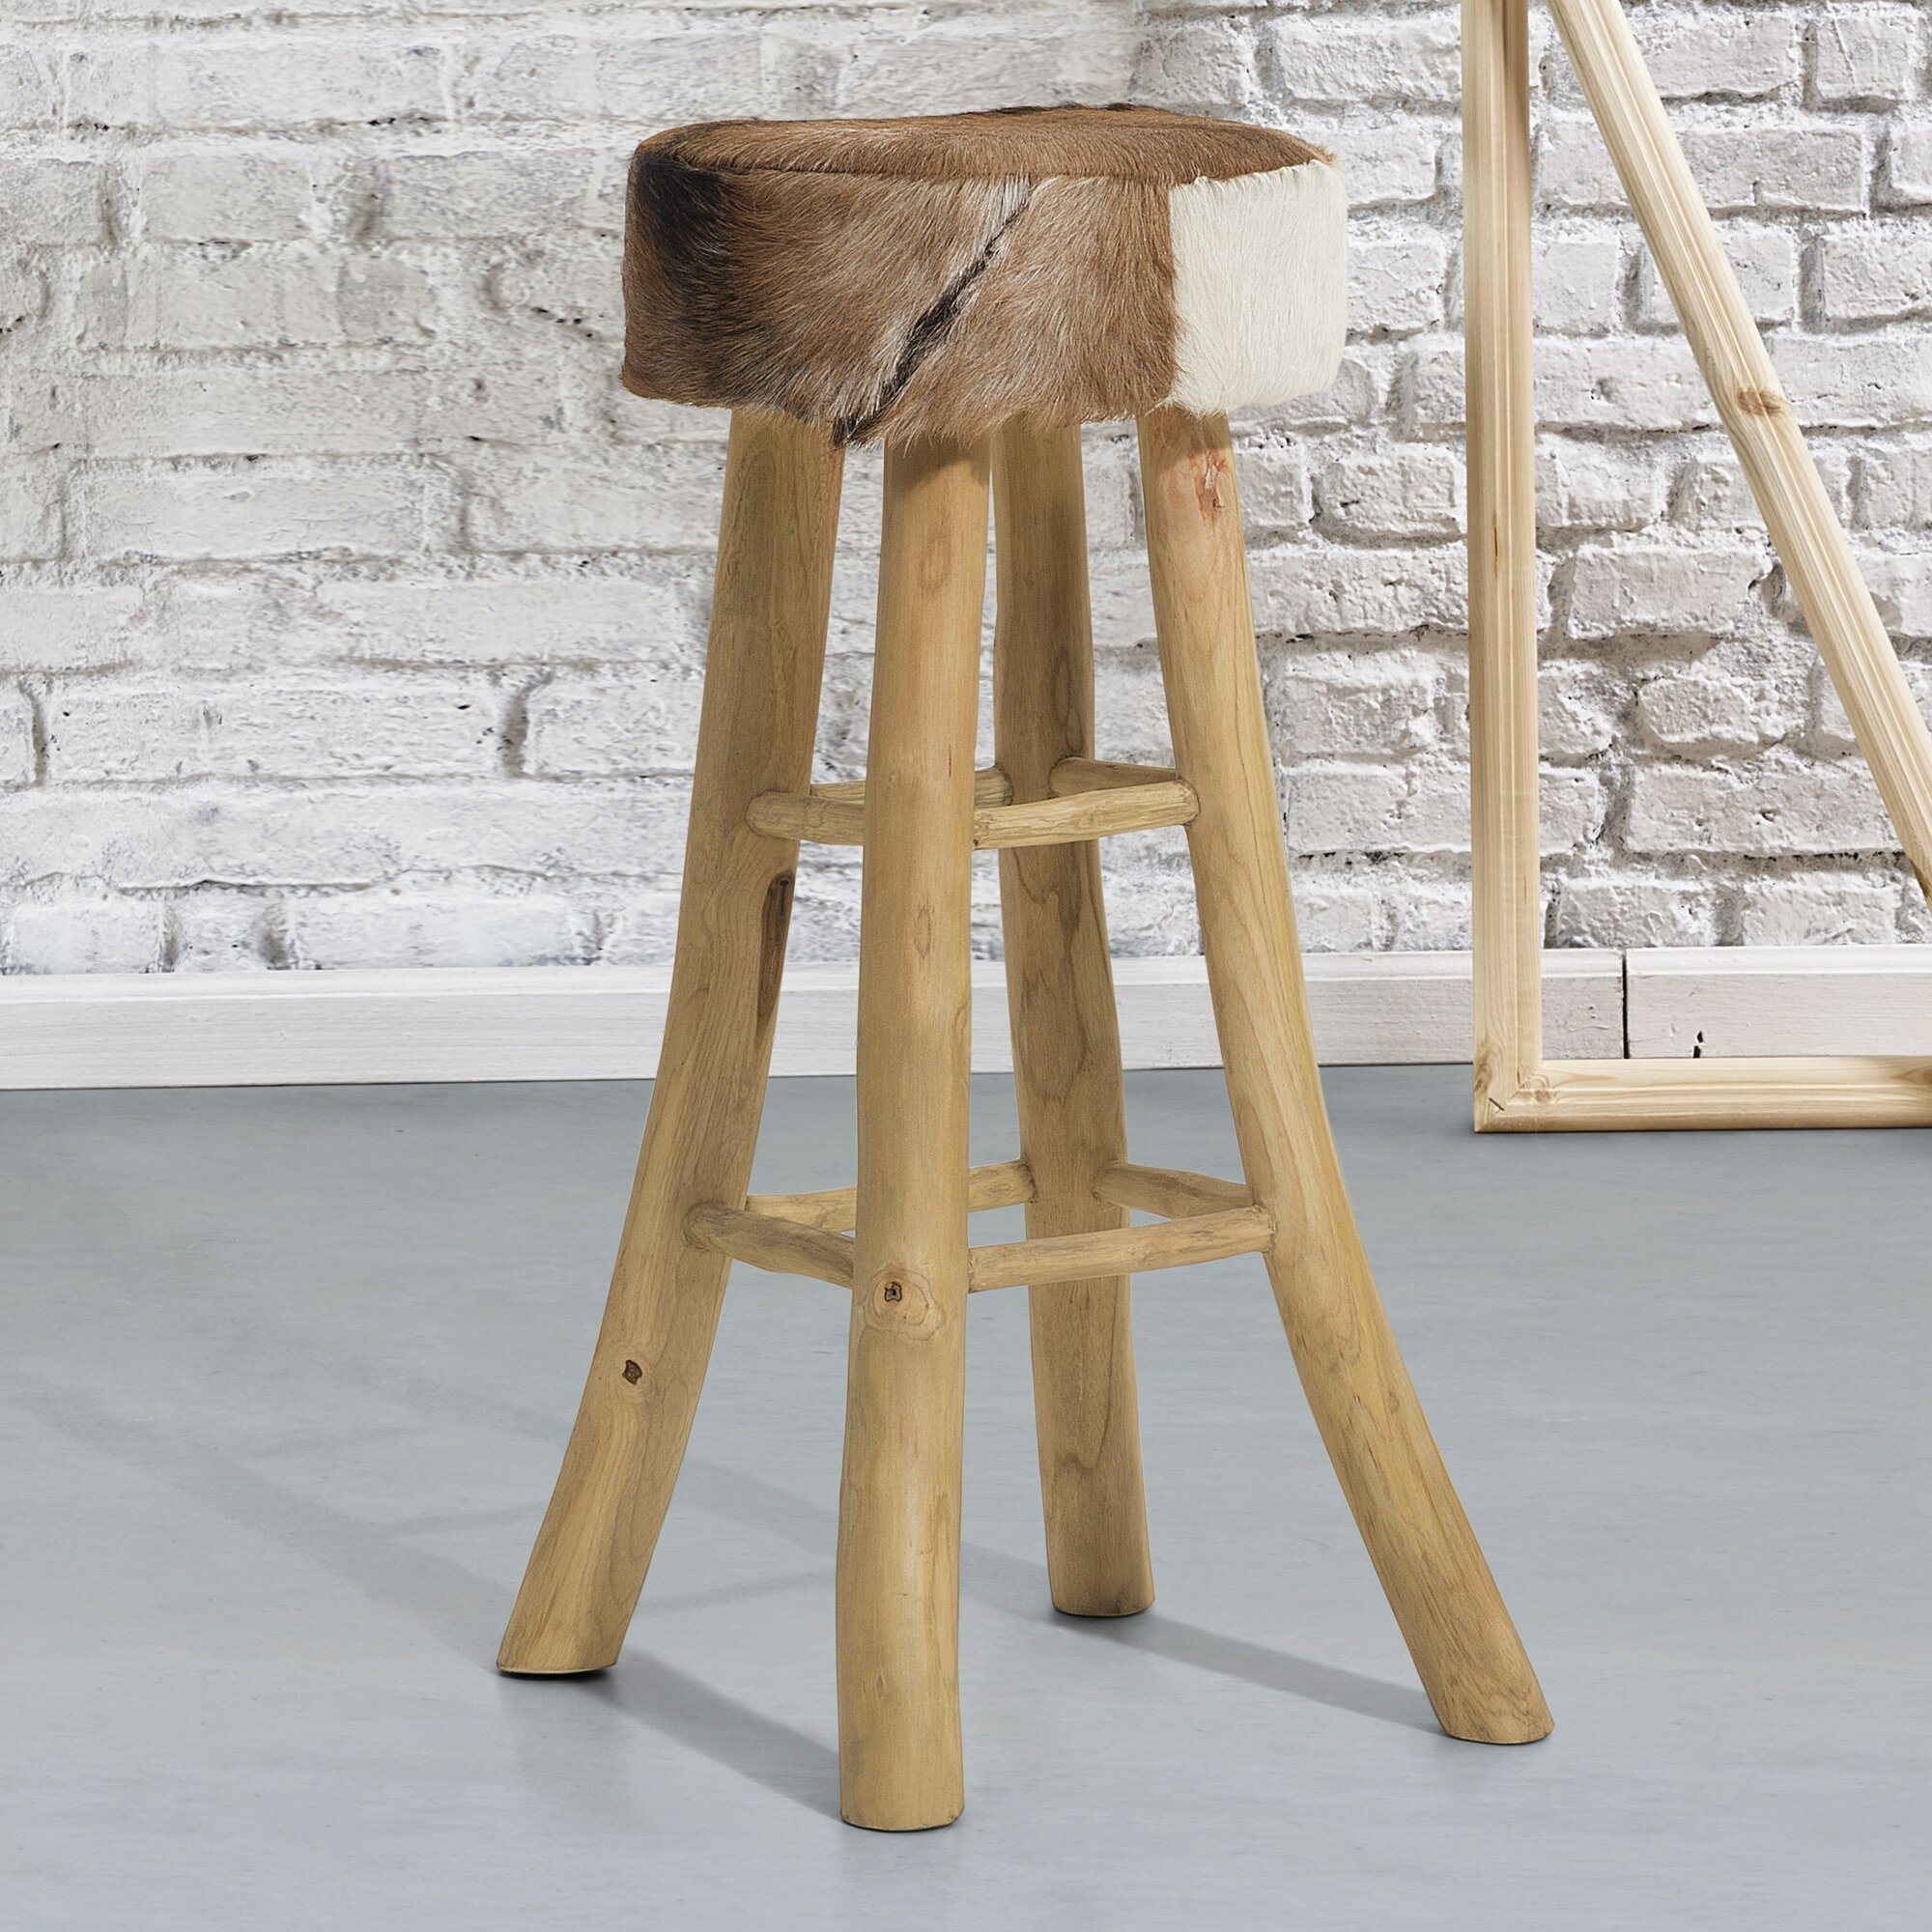 Home loft concept 80 cm barhocker dalton bewertungen for Barhocker 80 cm hoch